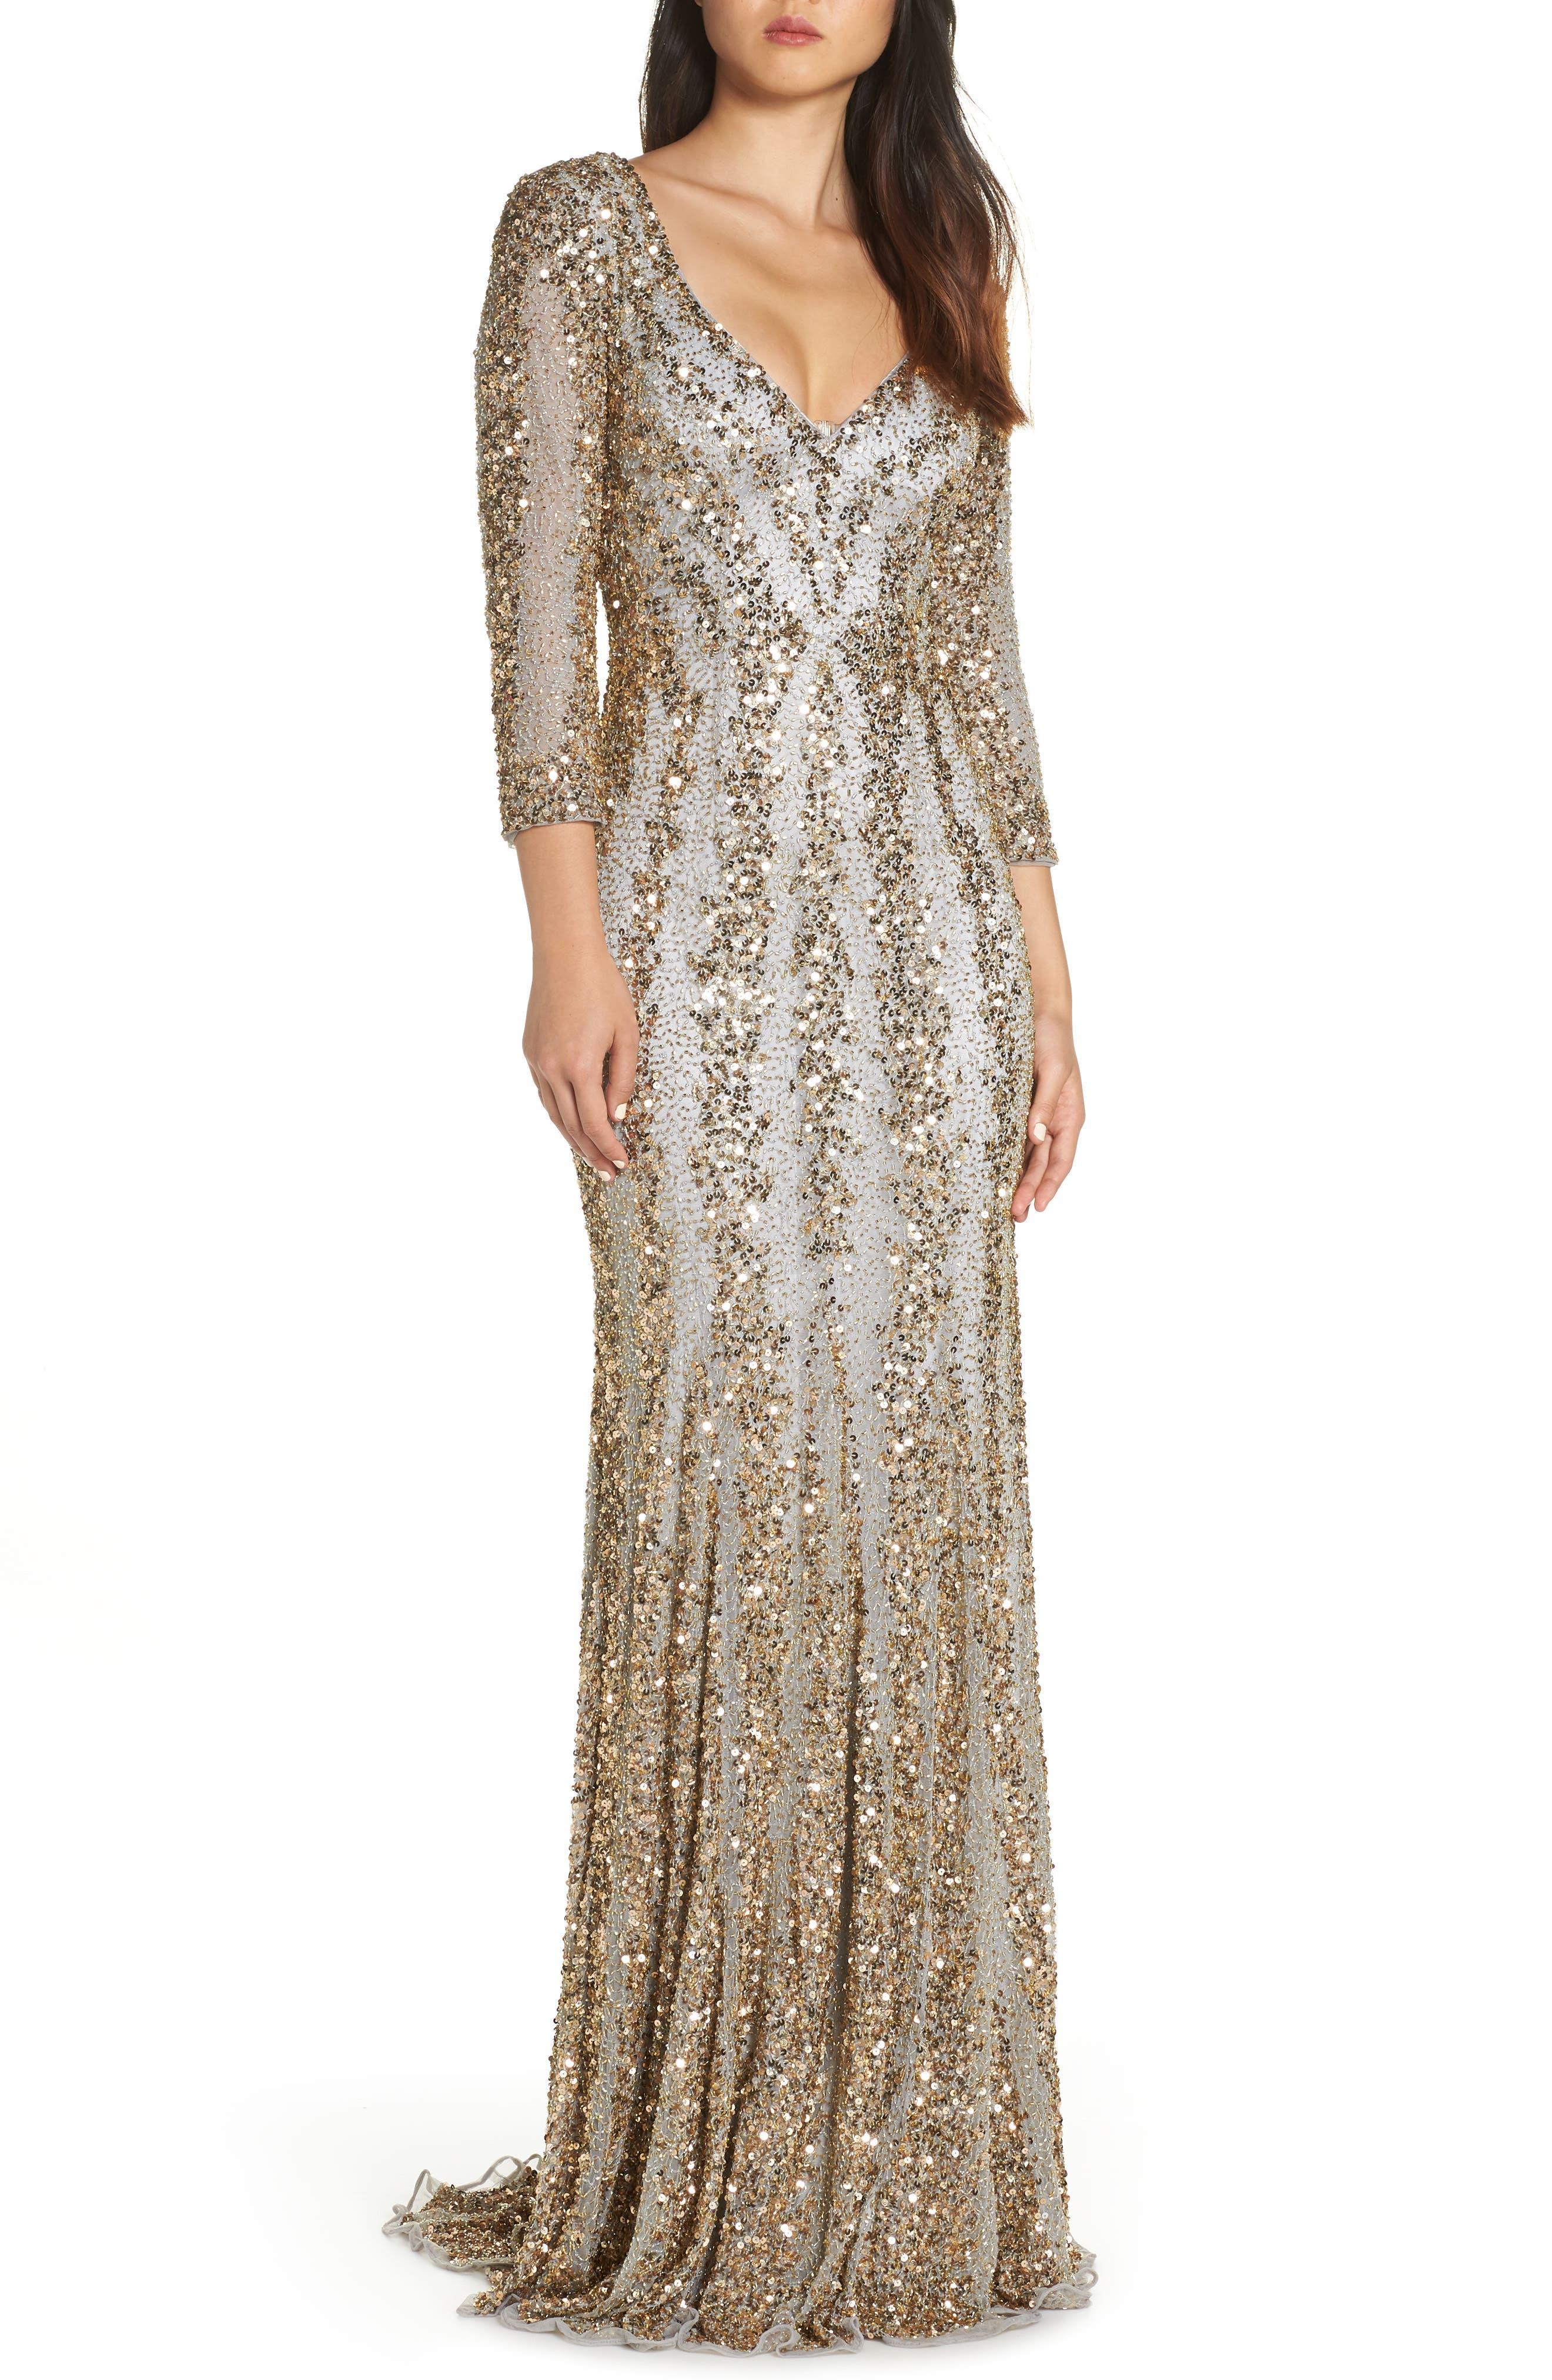 Sequin Gown,                             Main thumbnail 1, color,                             NUDE/ PLATINUM